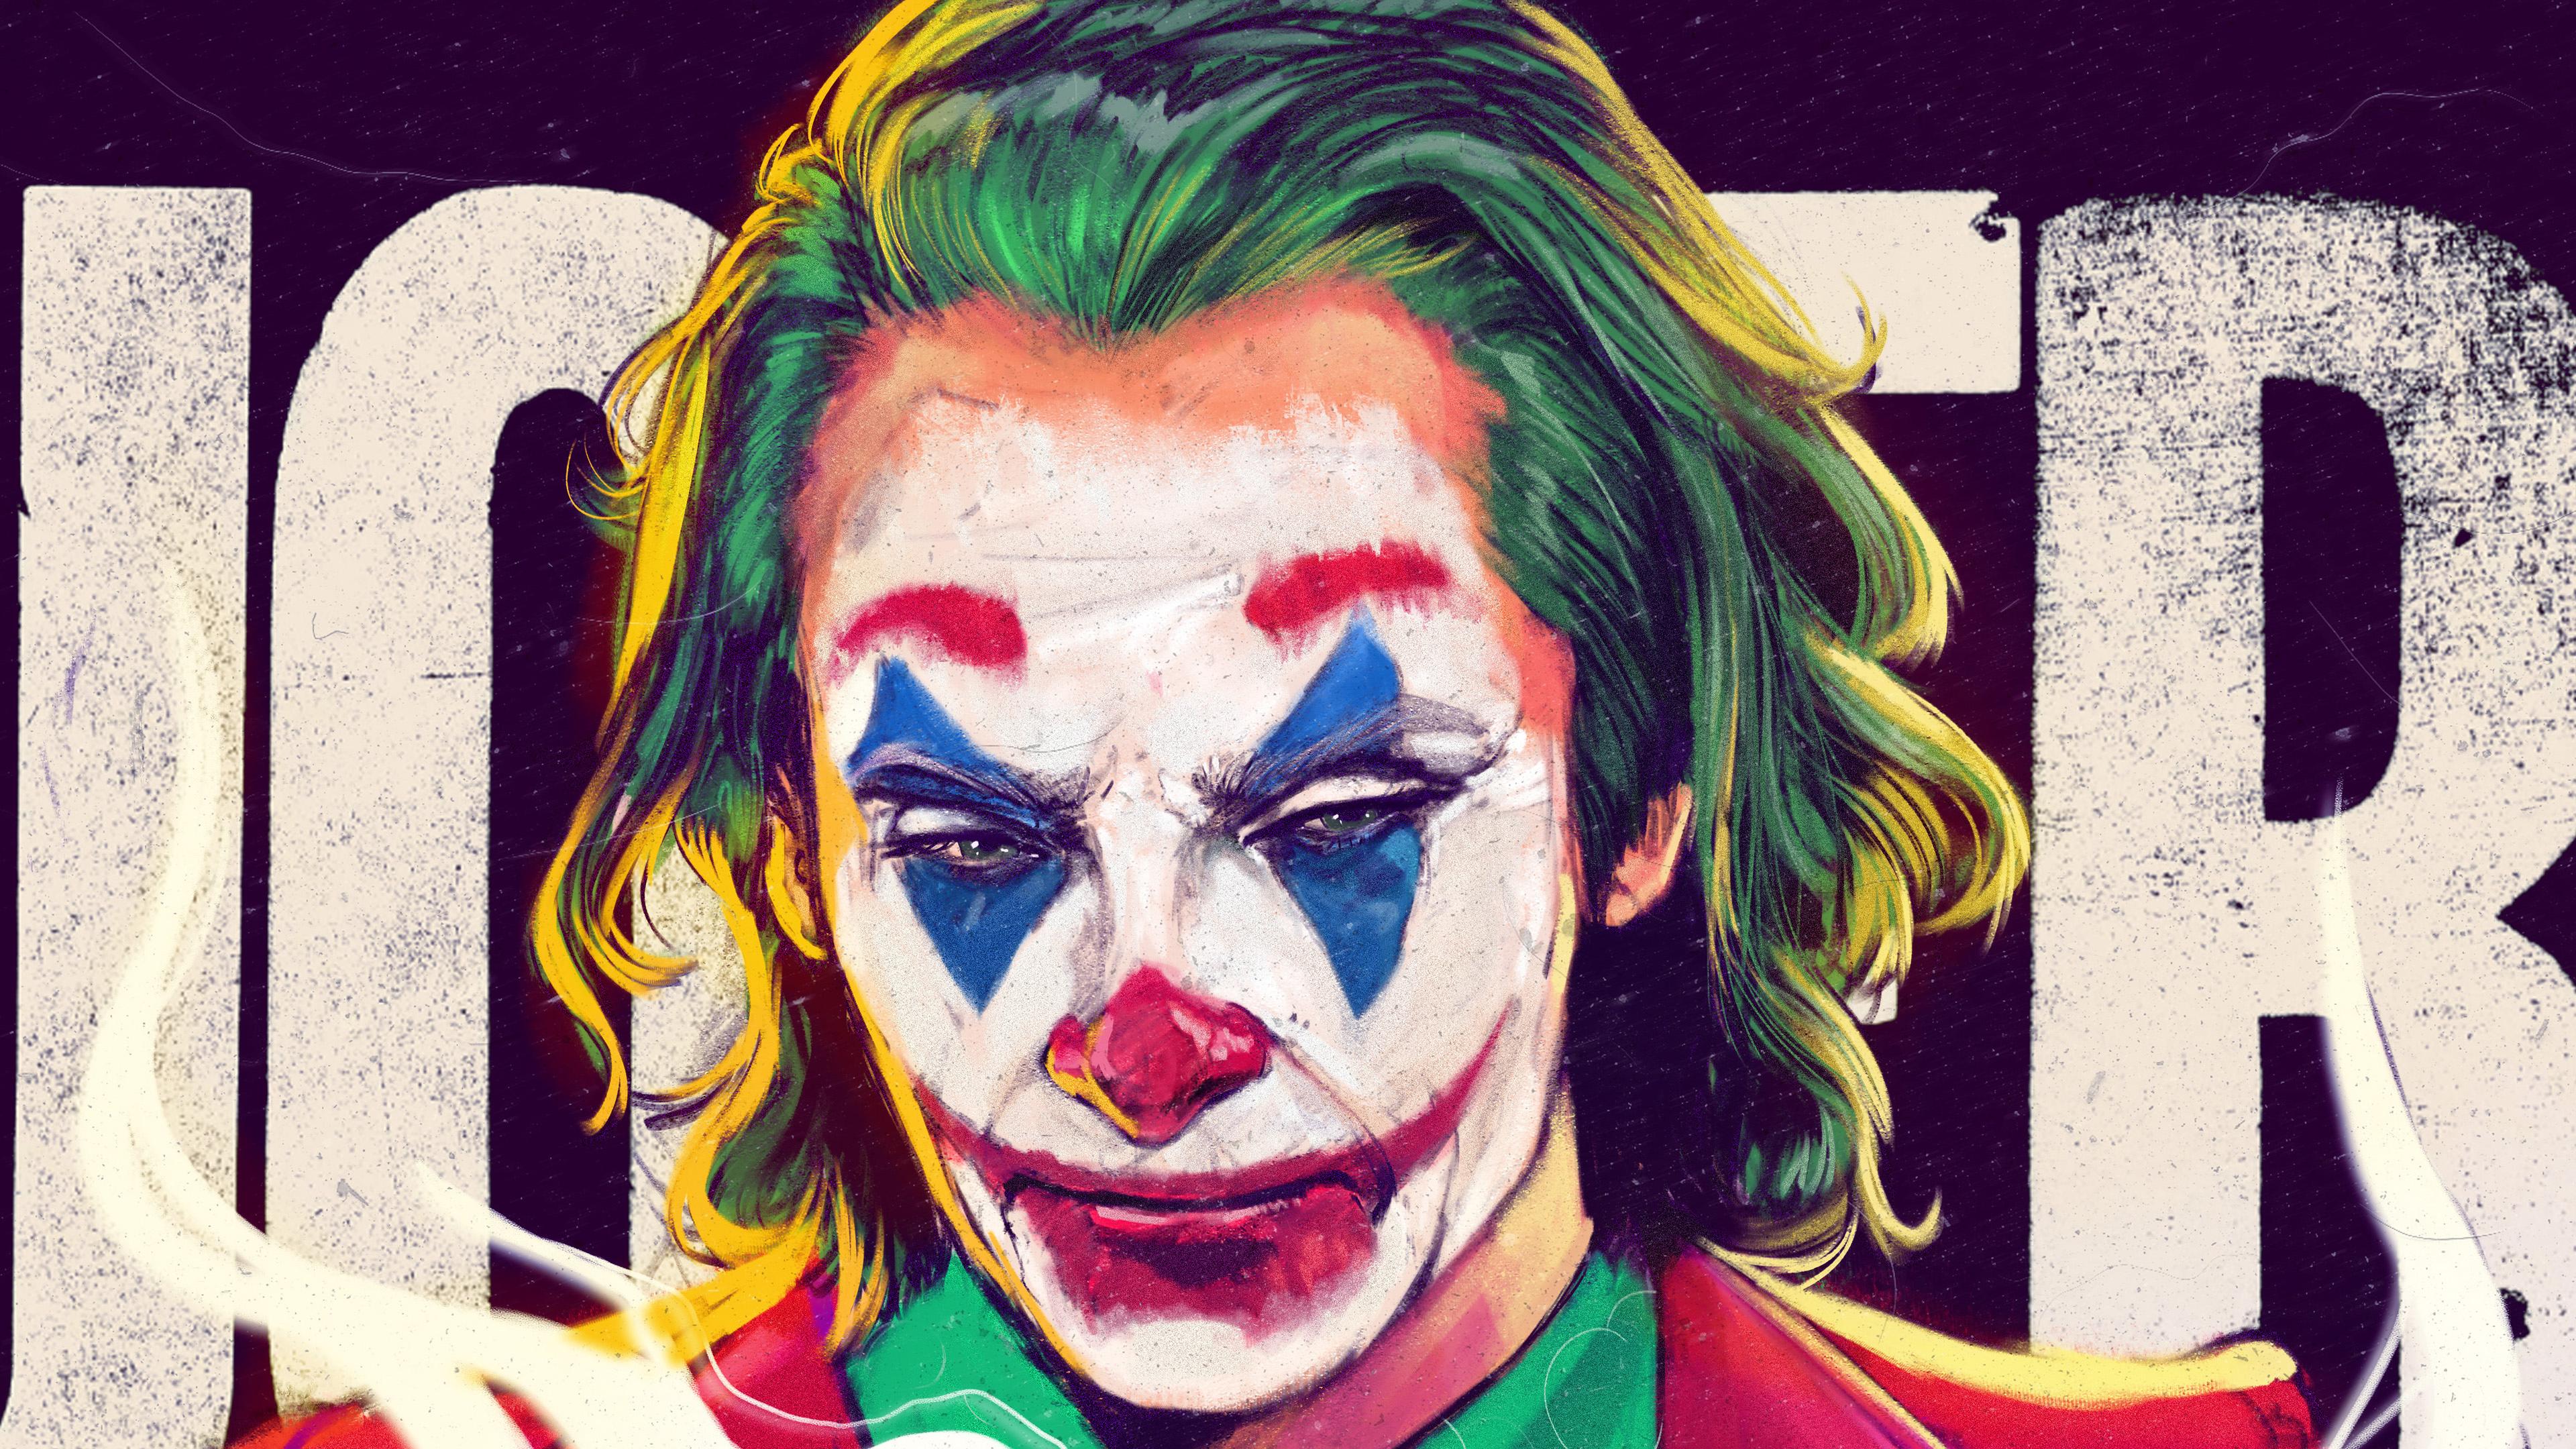 The Joker 4k Joaquin Phoenix Hd Superheroes 4k Wallpapers